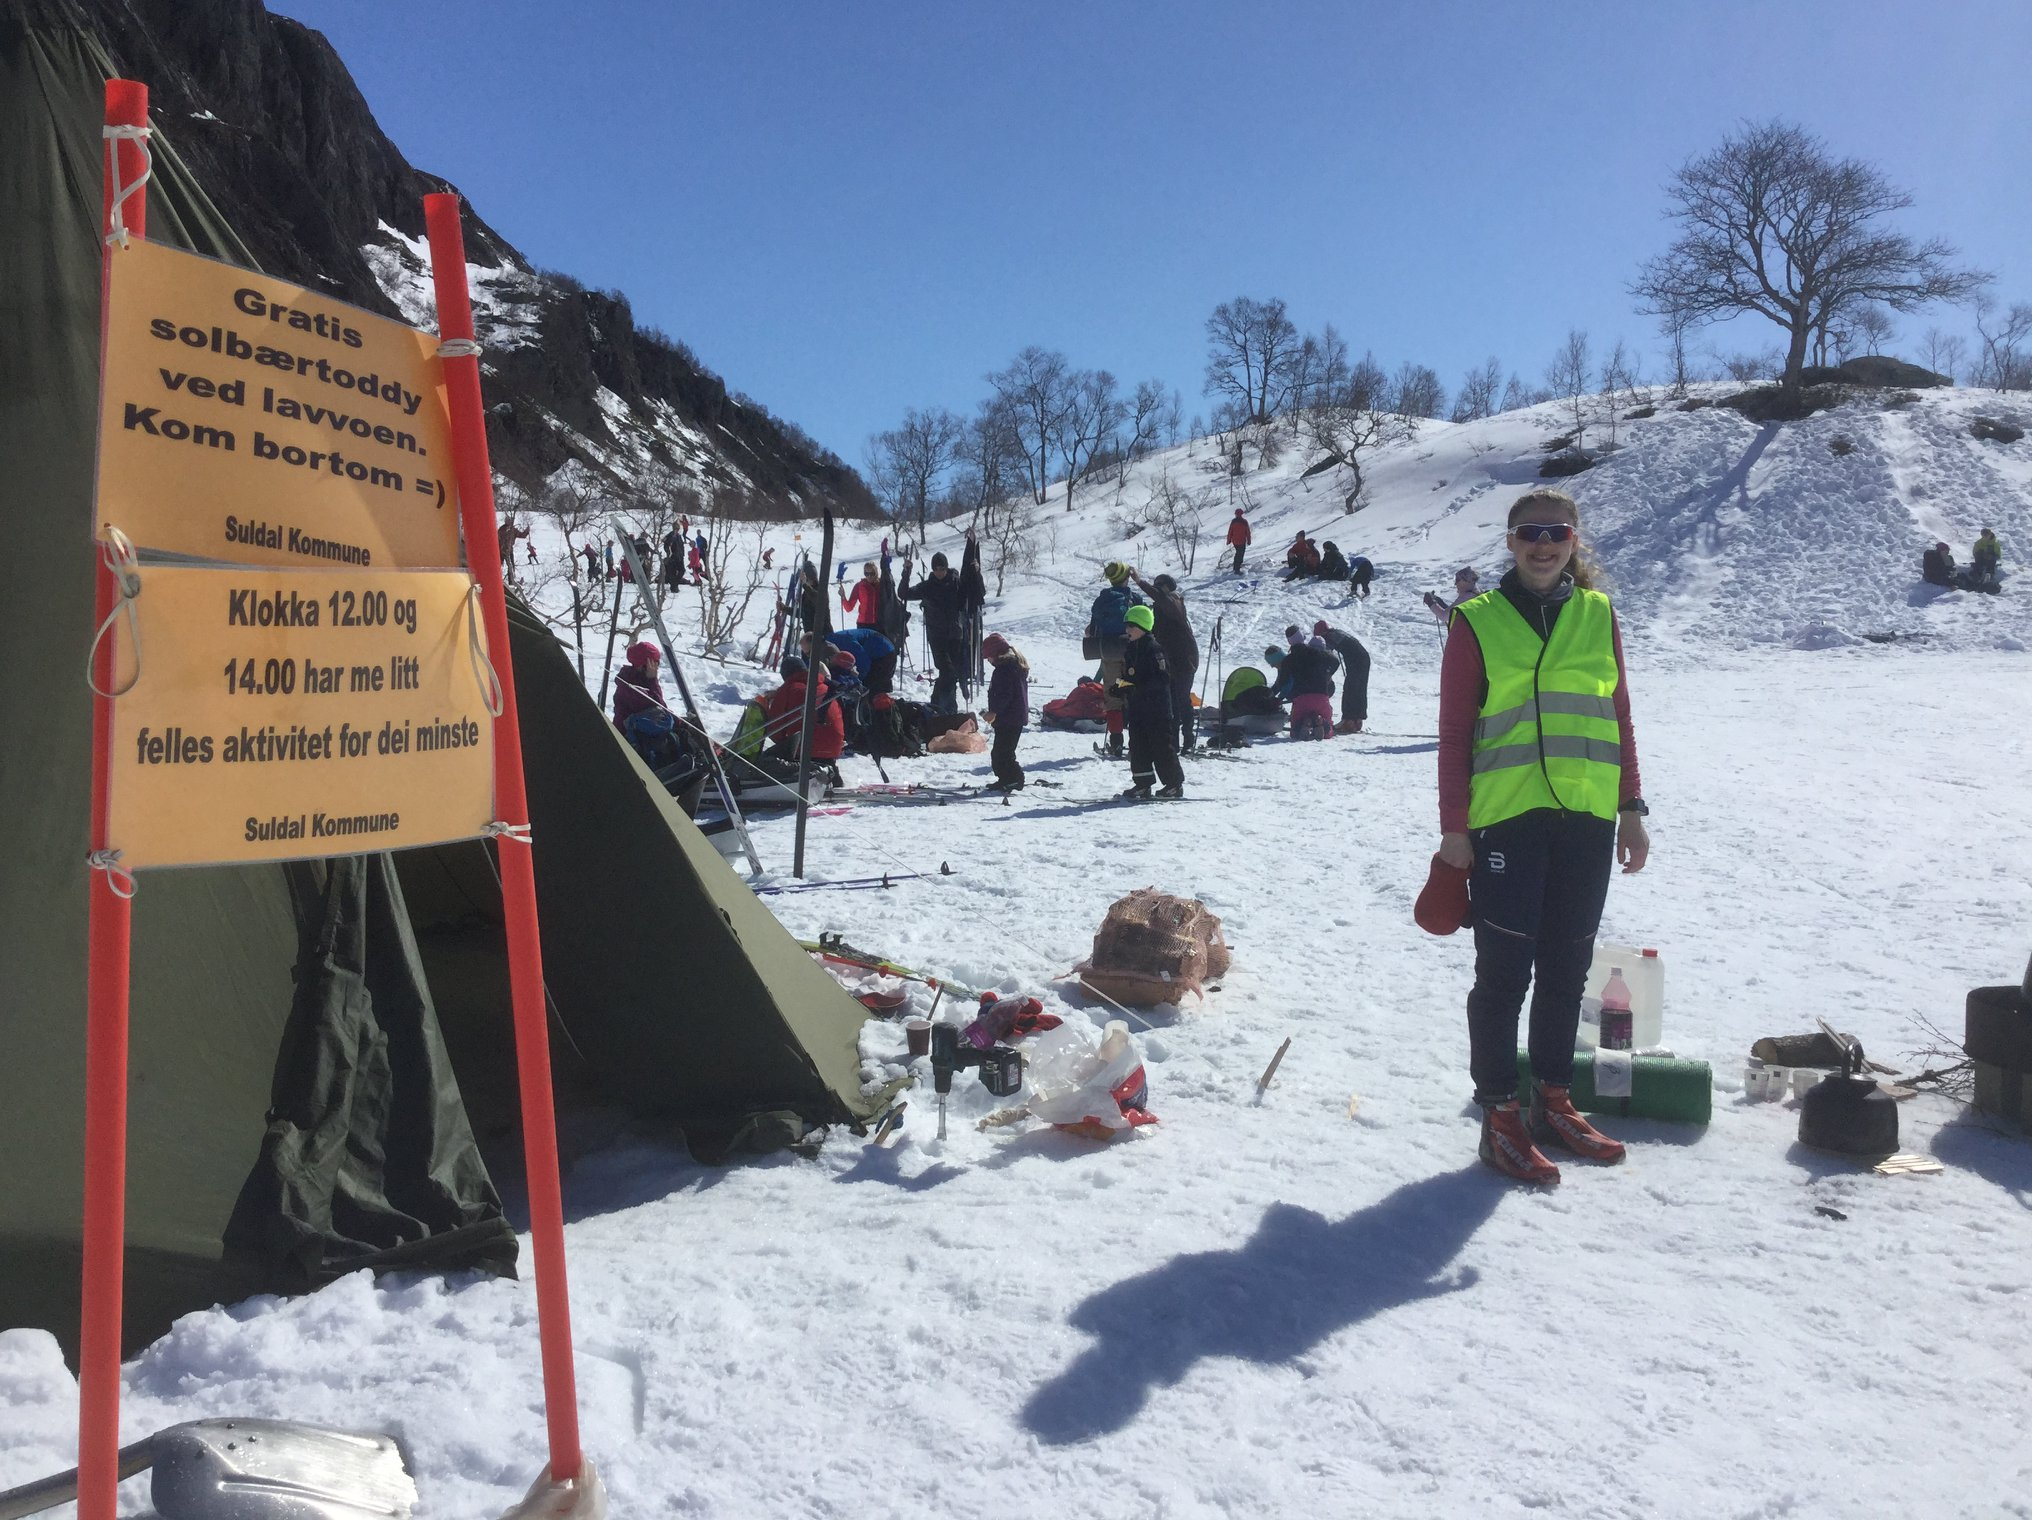 Children play area in snow